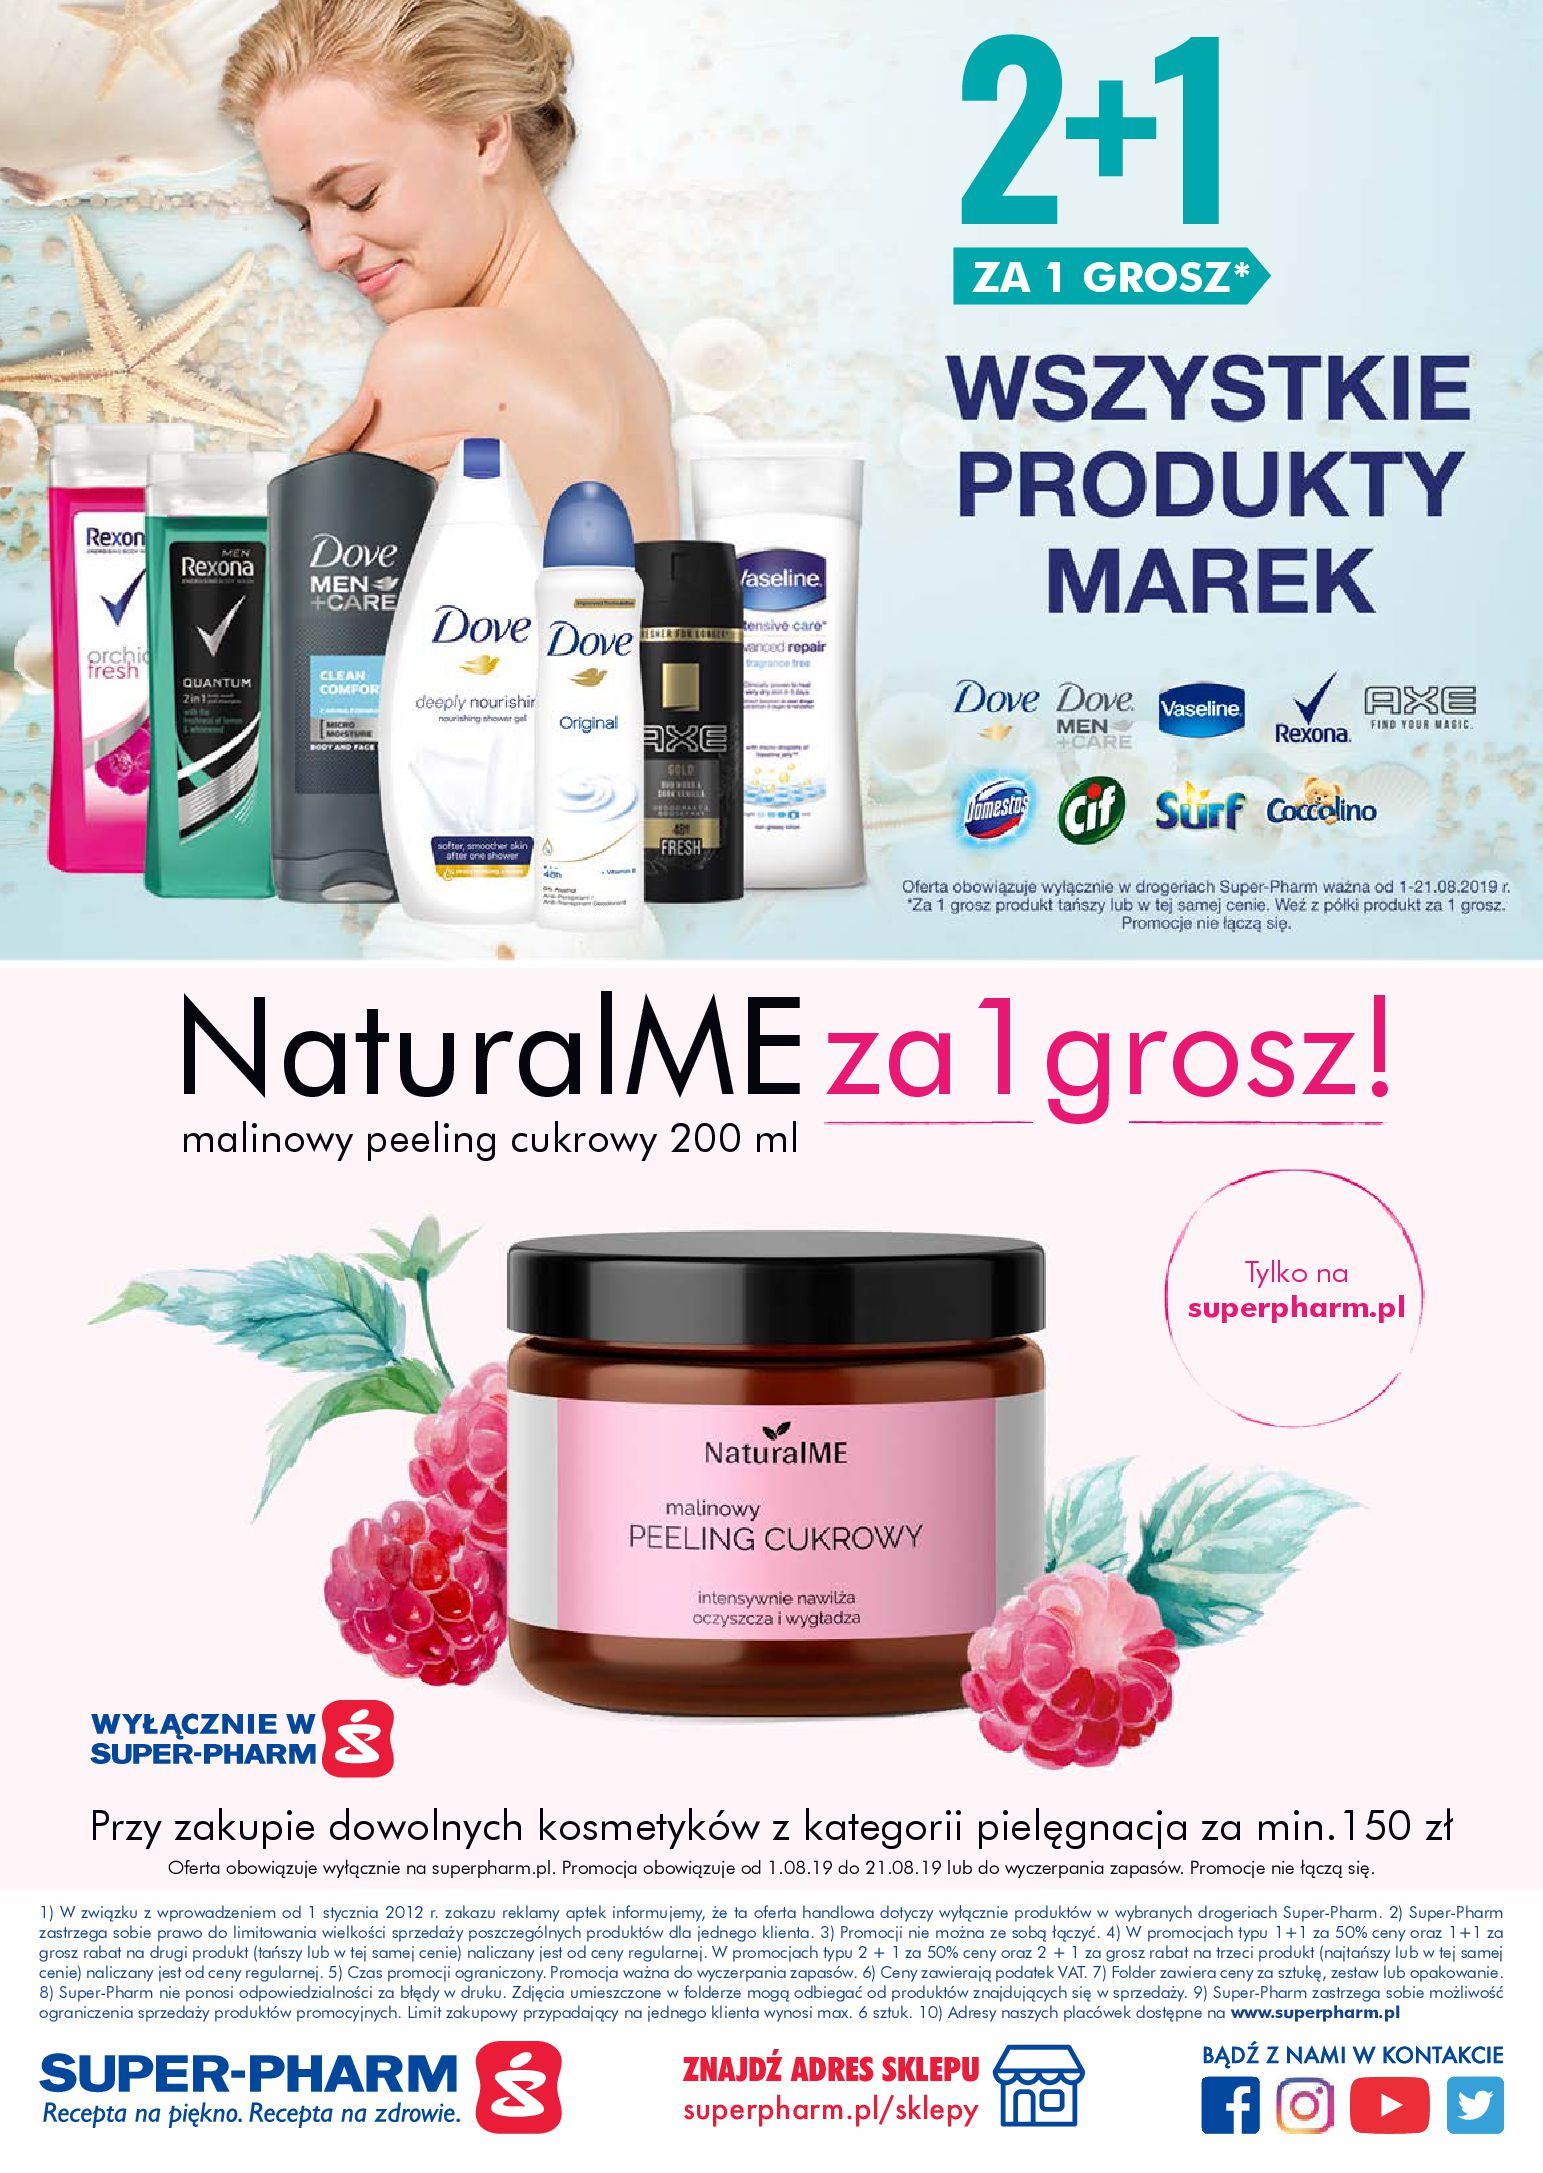 Gazetka Super-Pharm - Owocowe Lato-31.07.2019-21.08.2019-page-